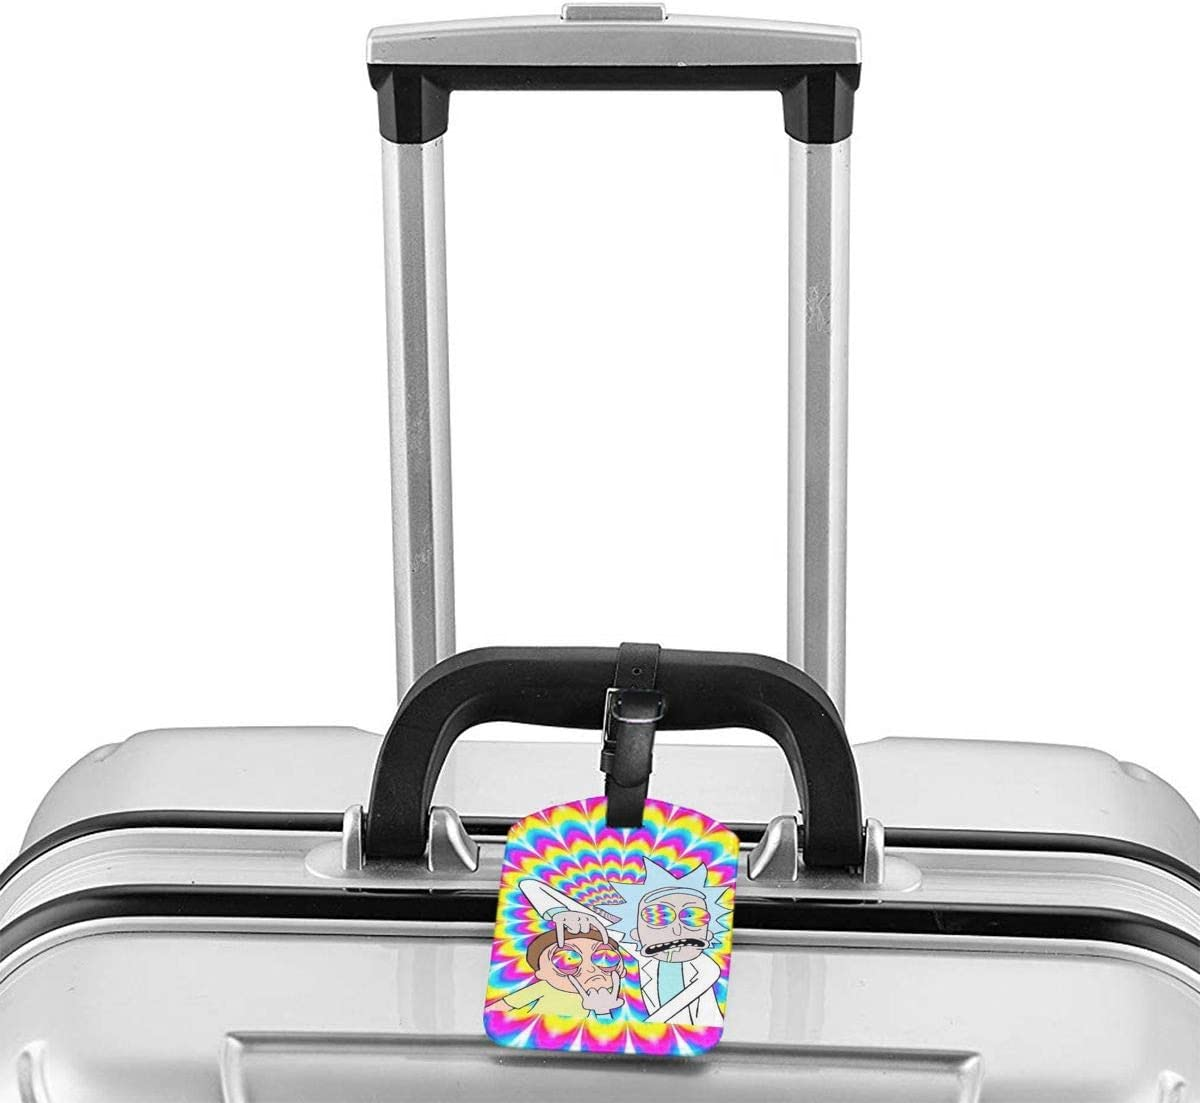 PU Leather Luggage Tags Spongebob Squarepants Suitcase Labels Bag Adjustable Leather Strap Travel Accessories Set of 2